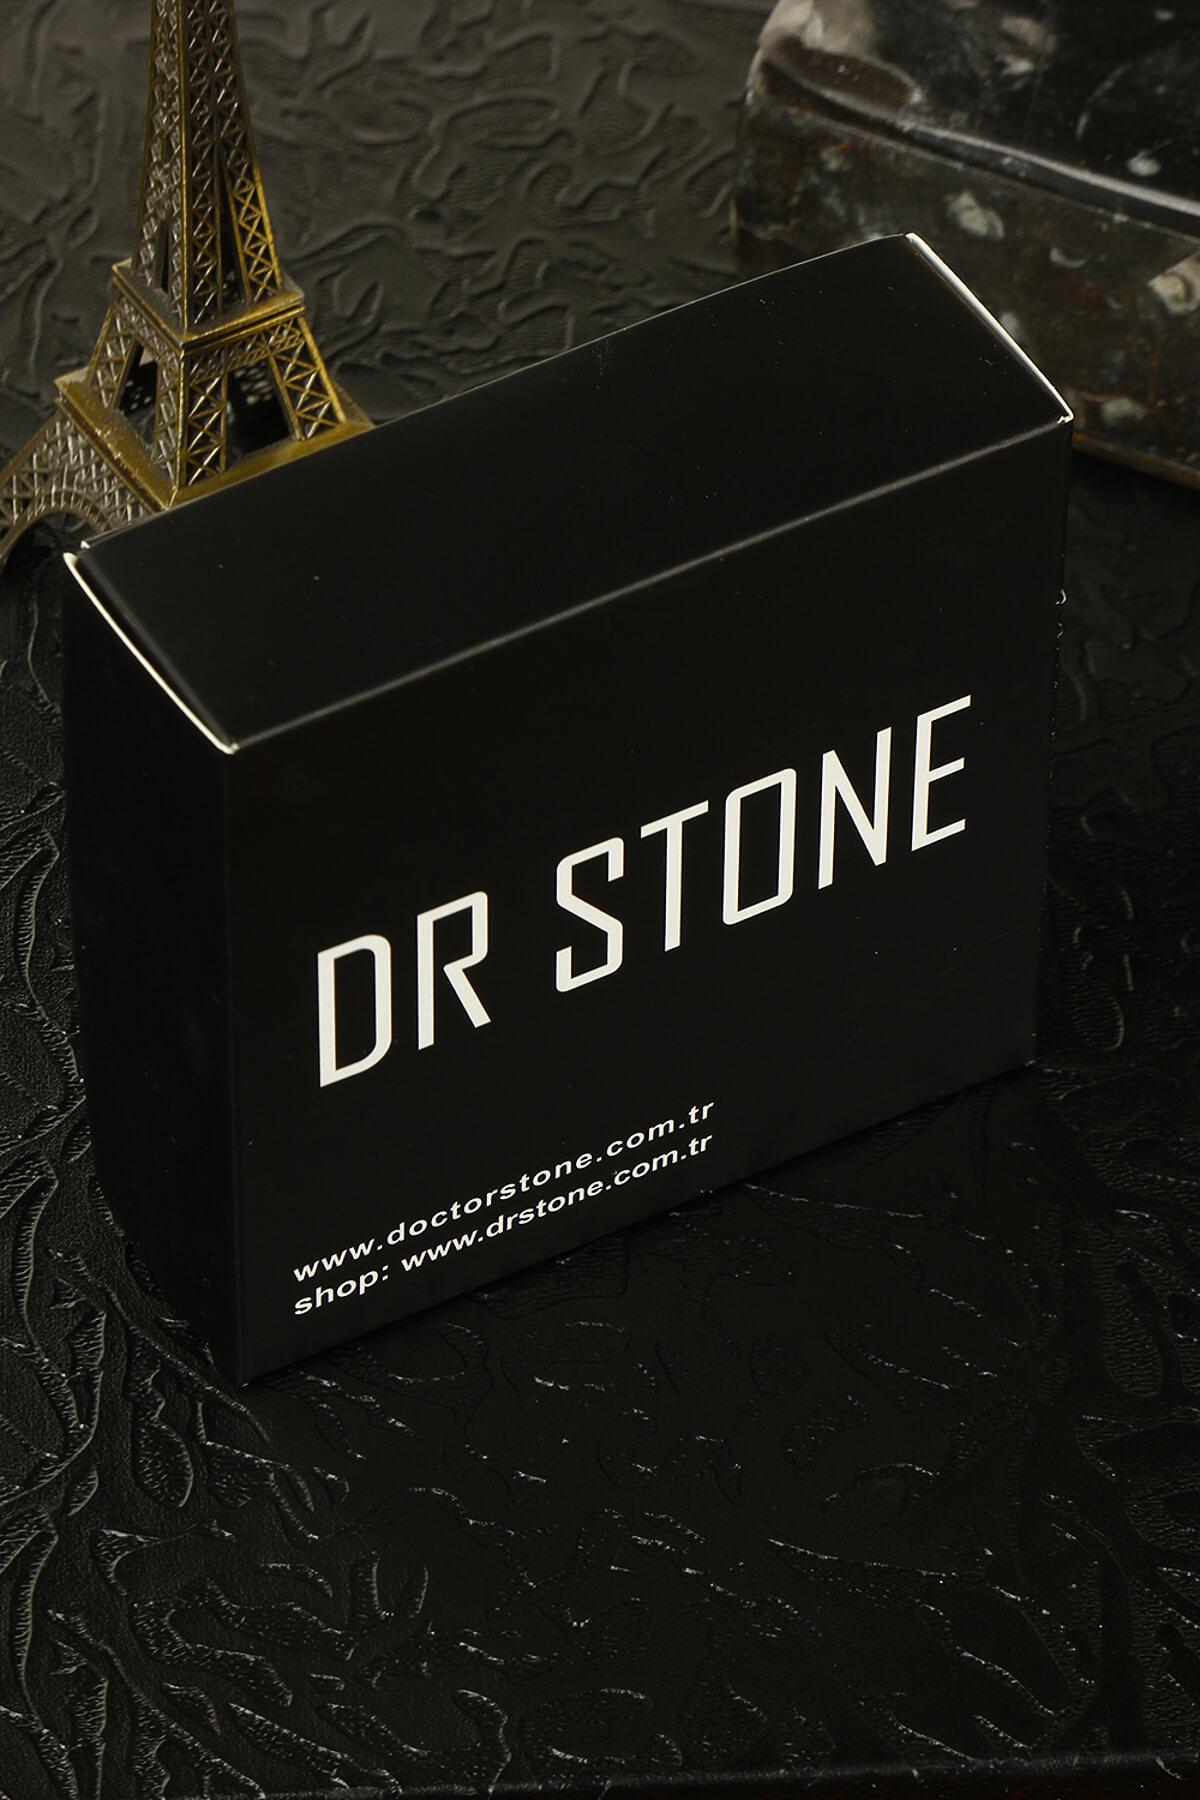 Dr. Stone Kadın Doğaltaş Kaplangözü Kolye Pirinç 121Ar40 2